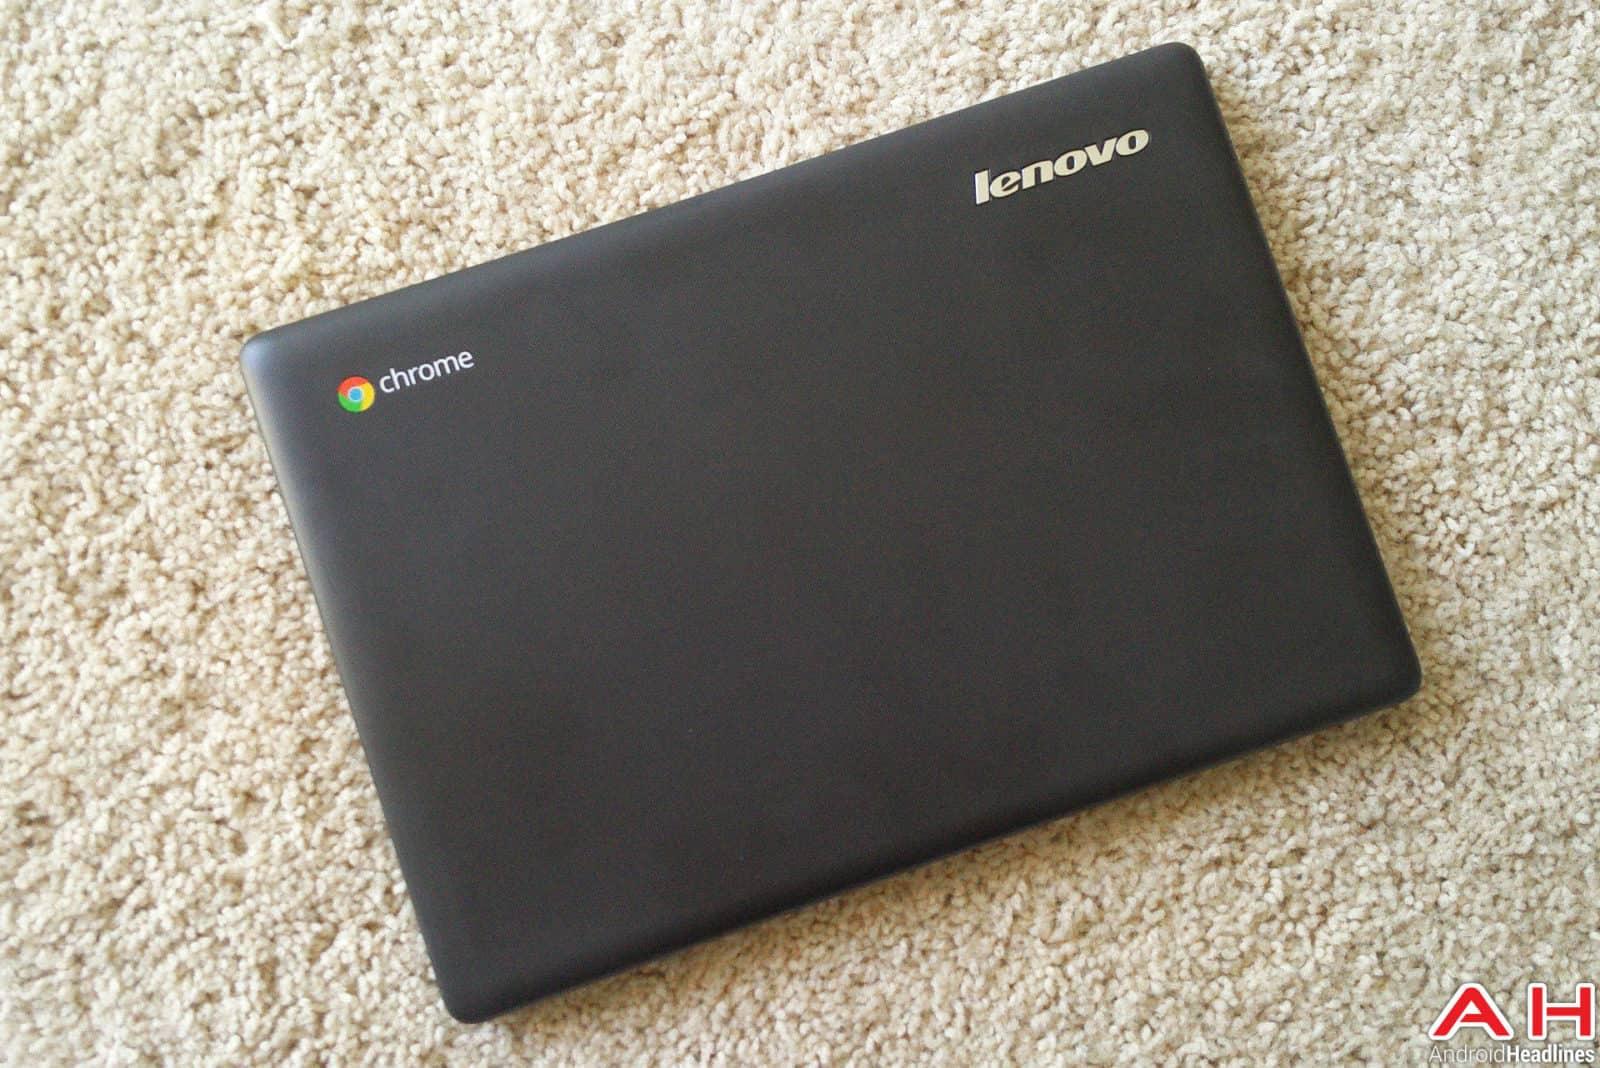 Lenovo 100s Chromebook AH